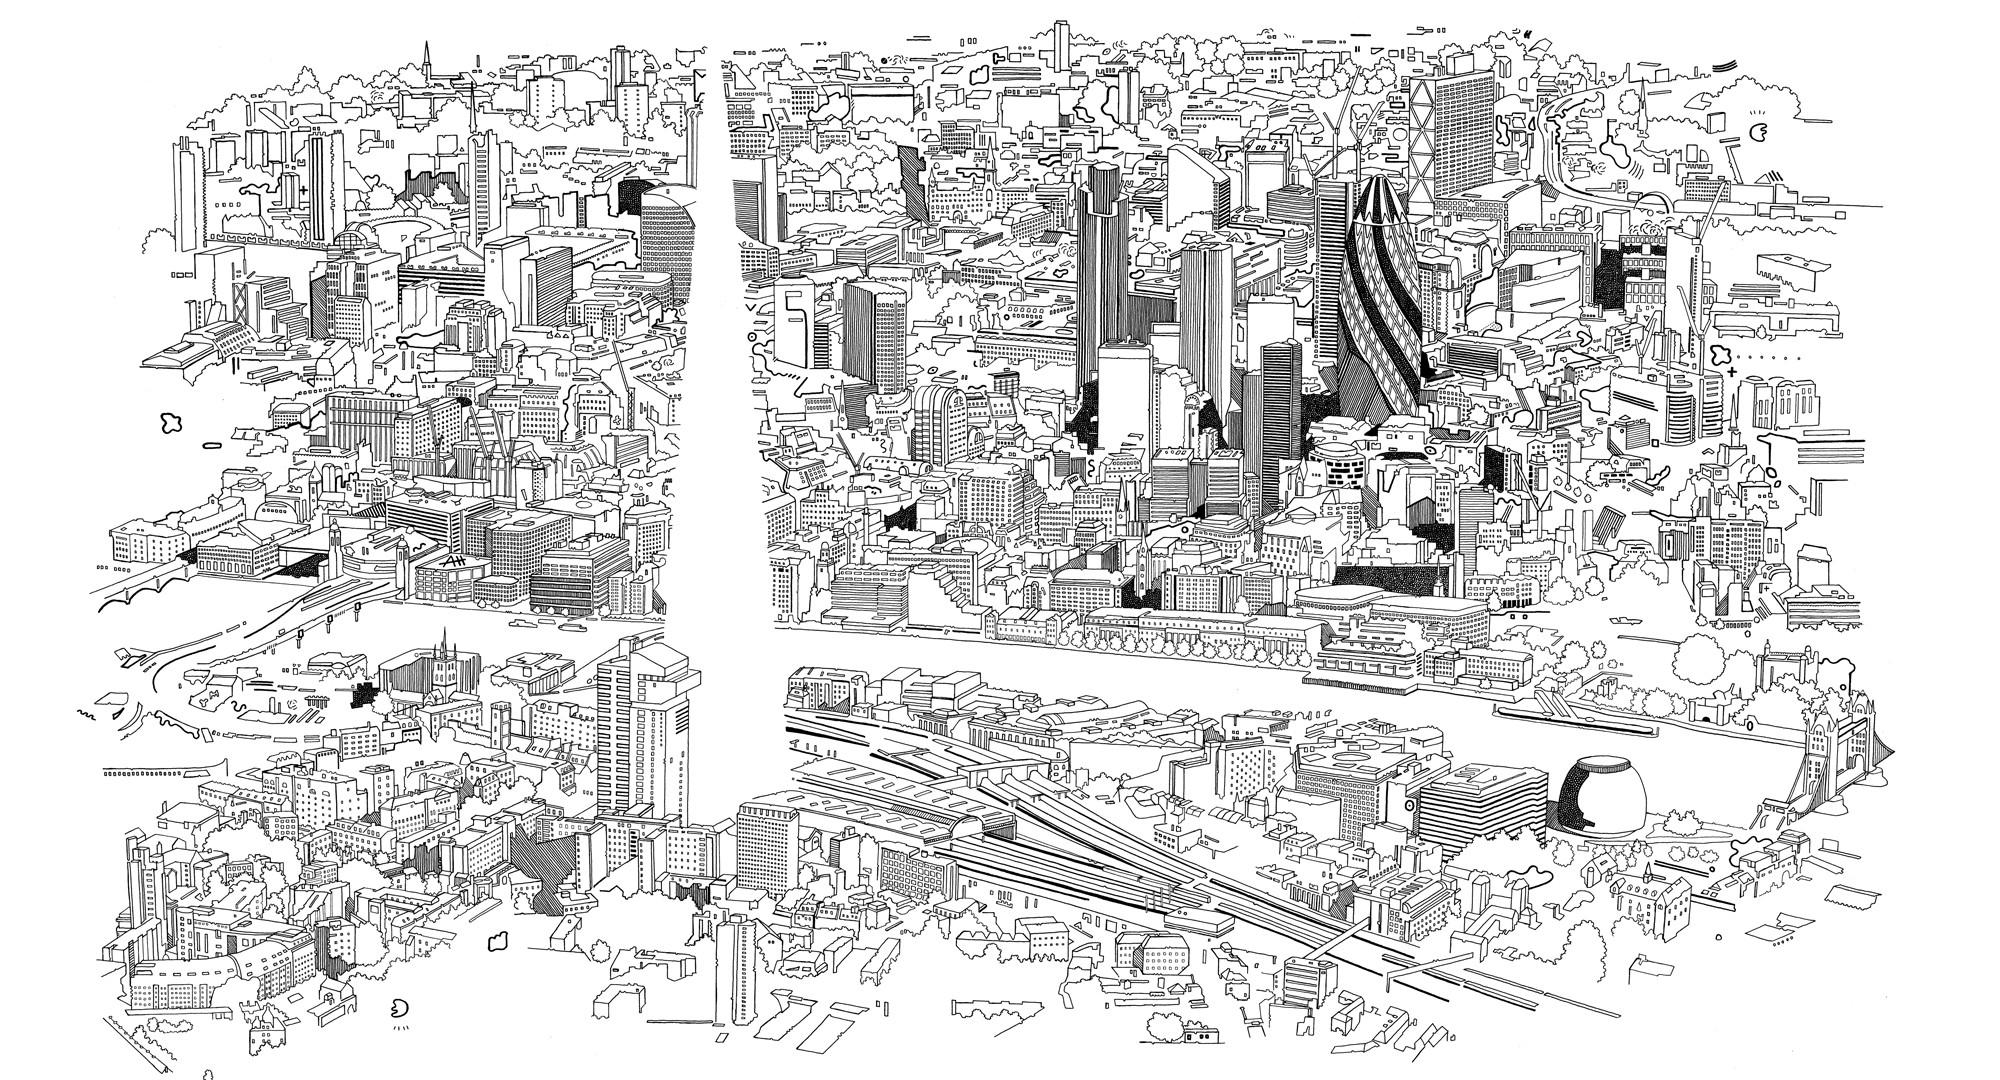 london2012 by Chris Denty.